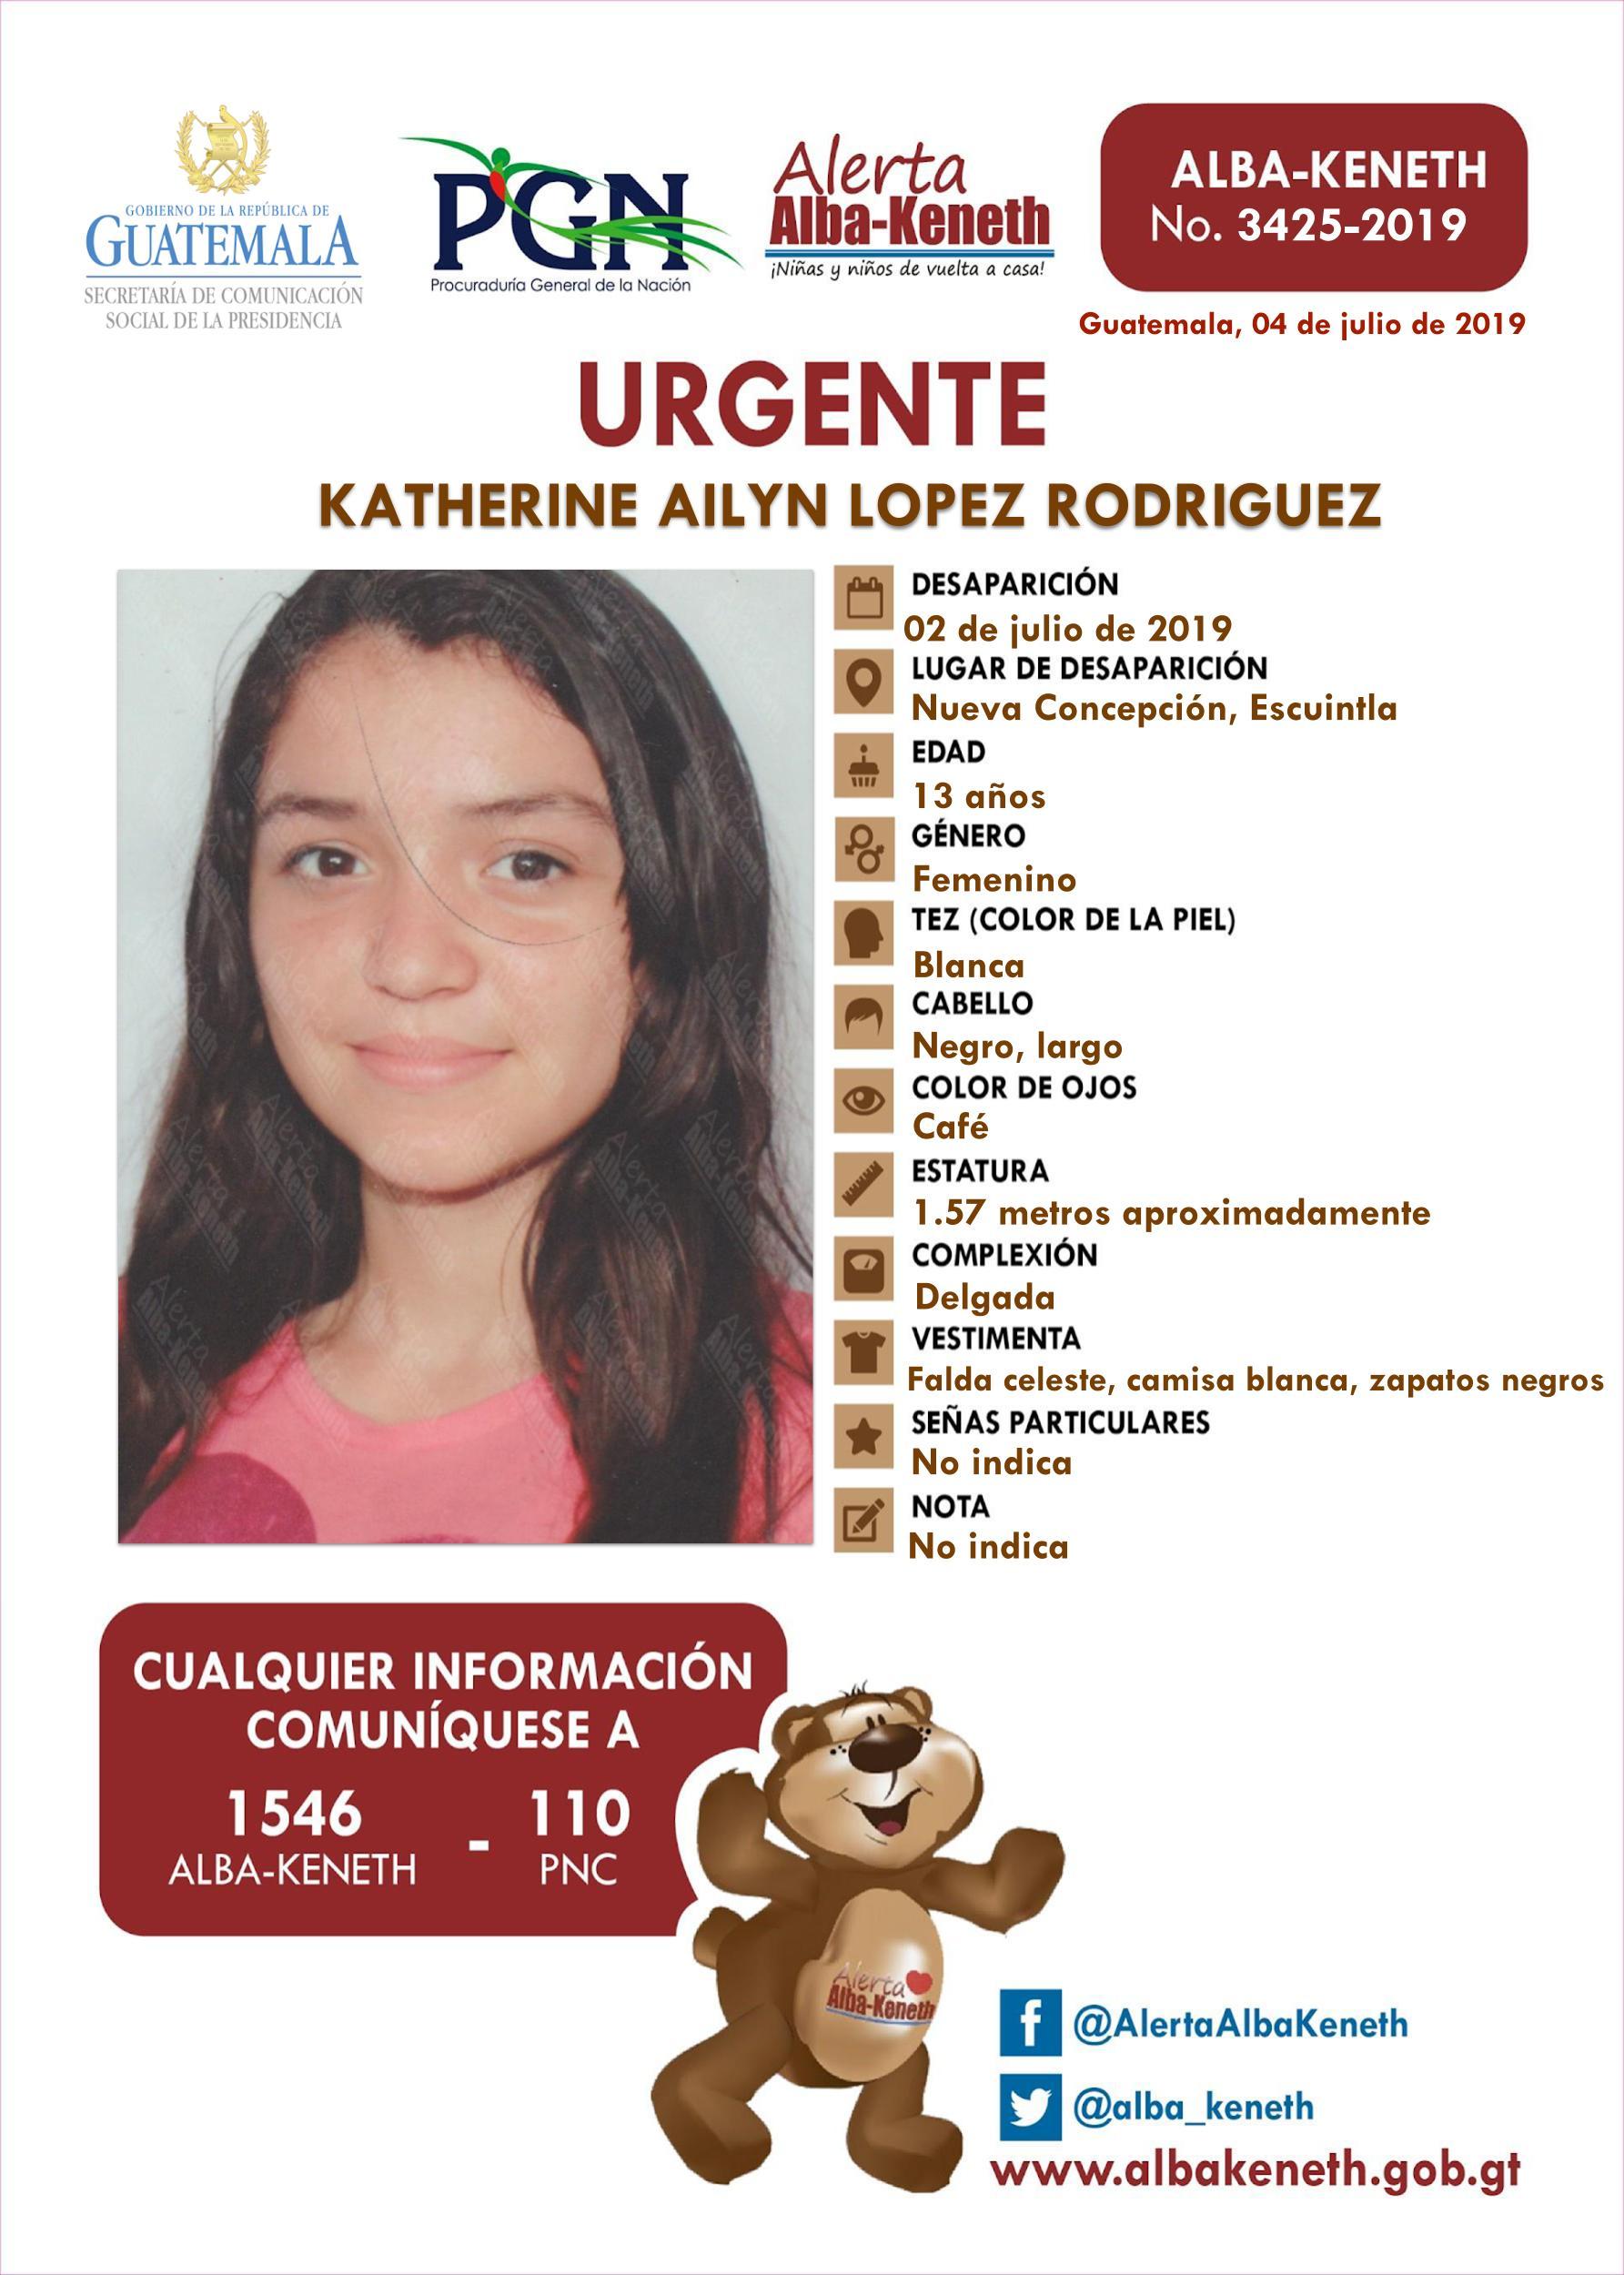 Katherine Ailyn Lopez Rodriguez